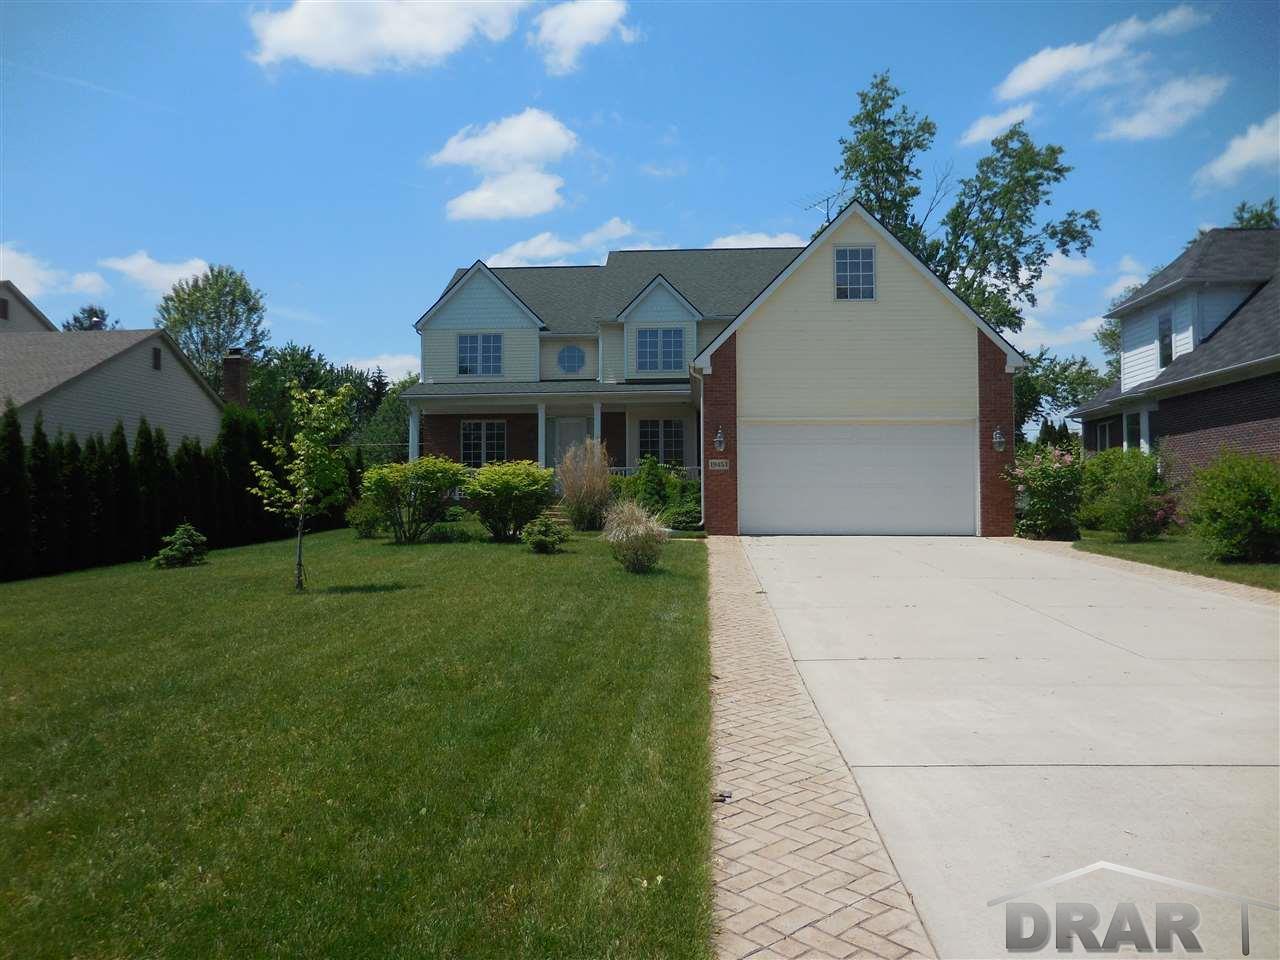 Real Estate for Sale, ListingId: 33150274, Livonia,MI48152